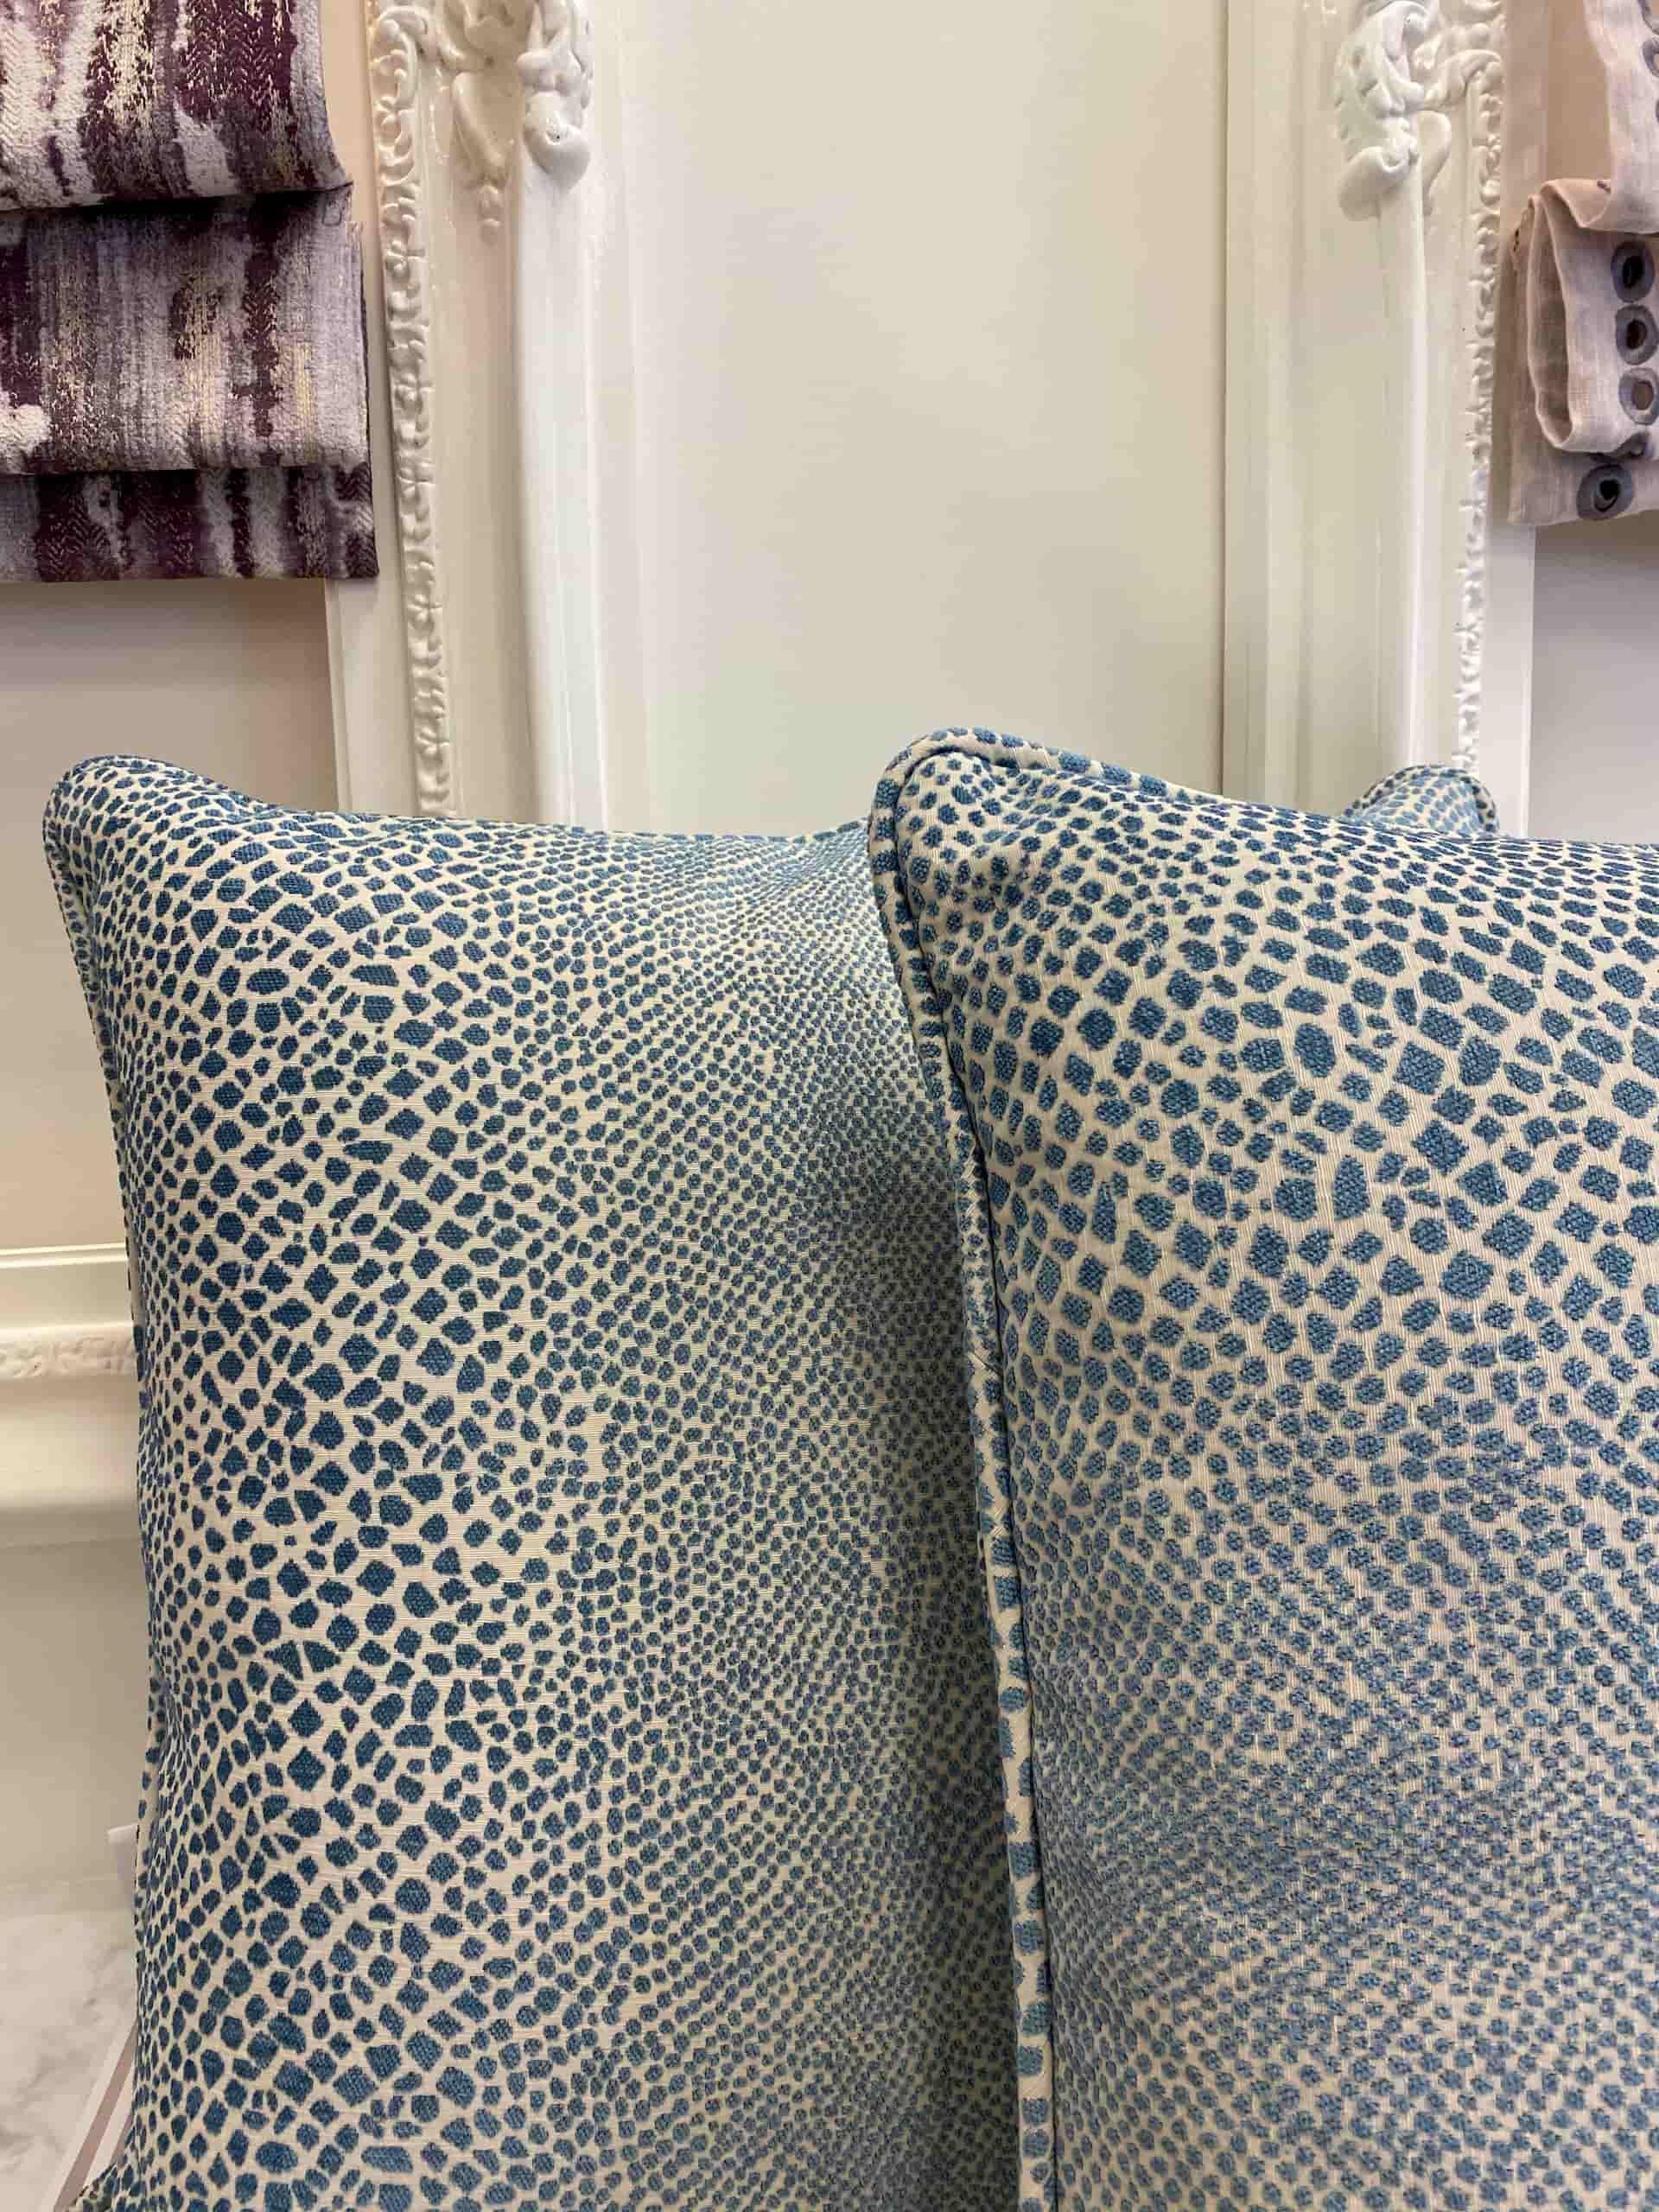 Animal Print Pillows